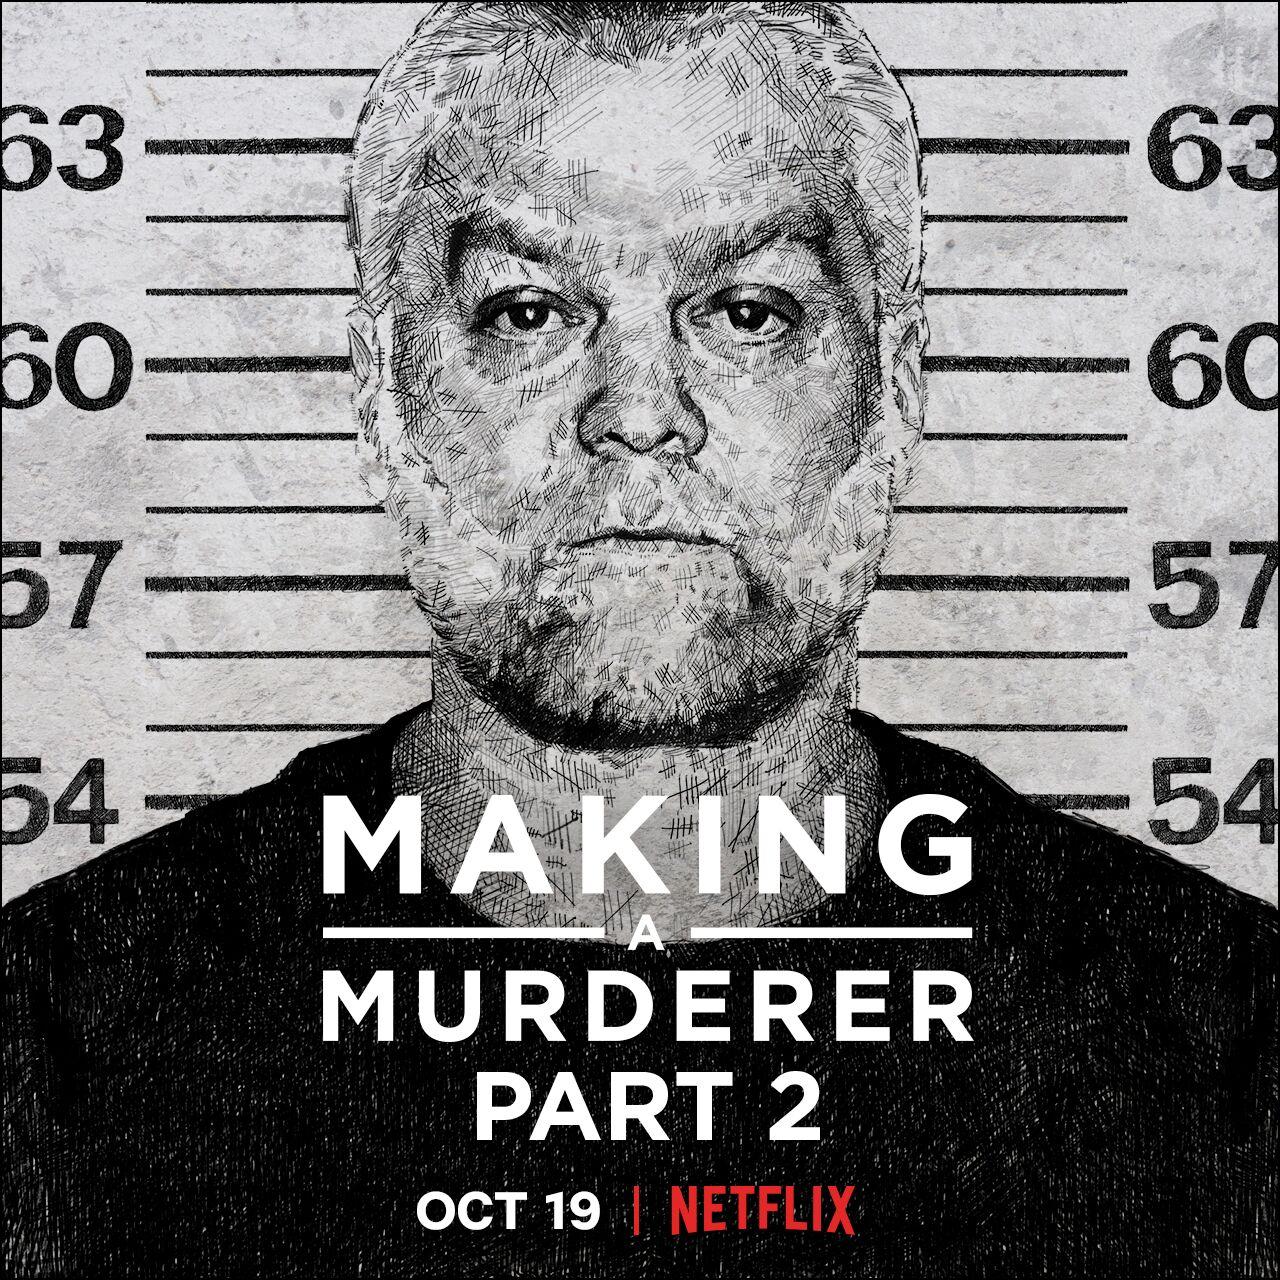 Making a murderer del 2 Netflix